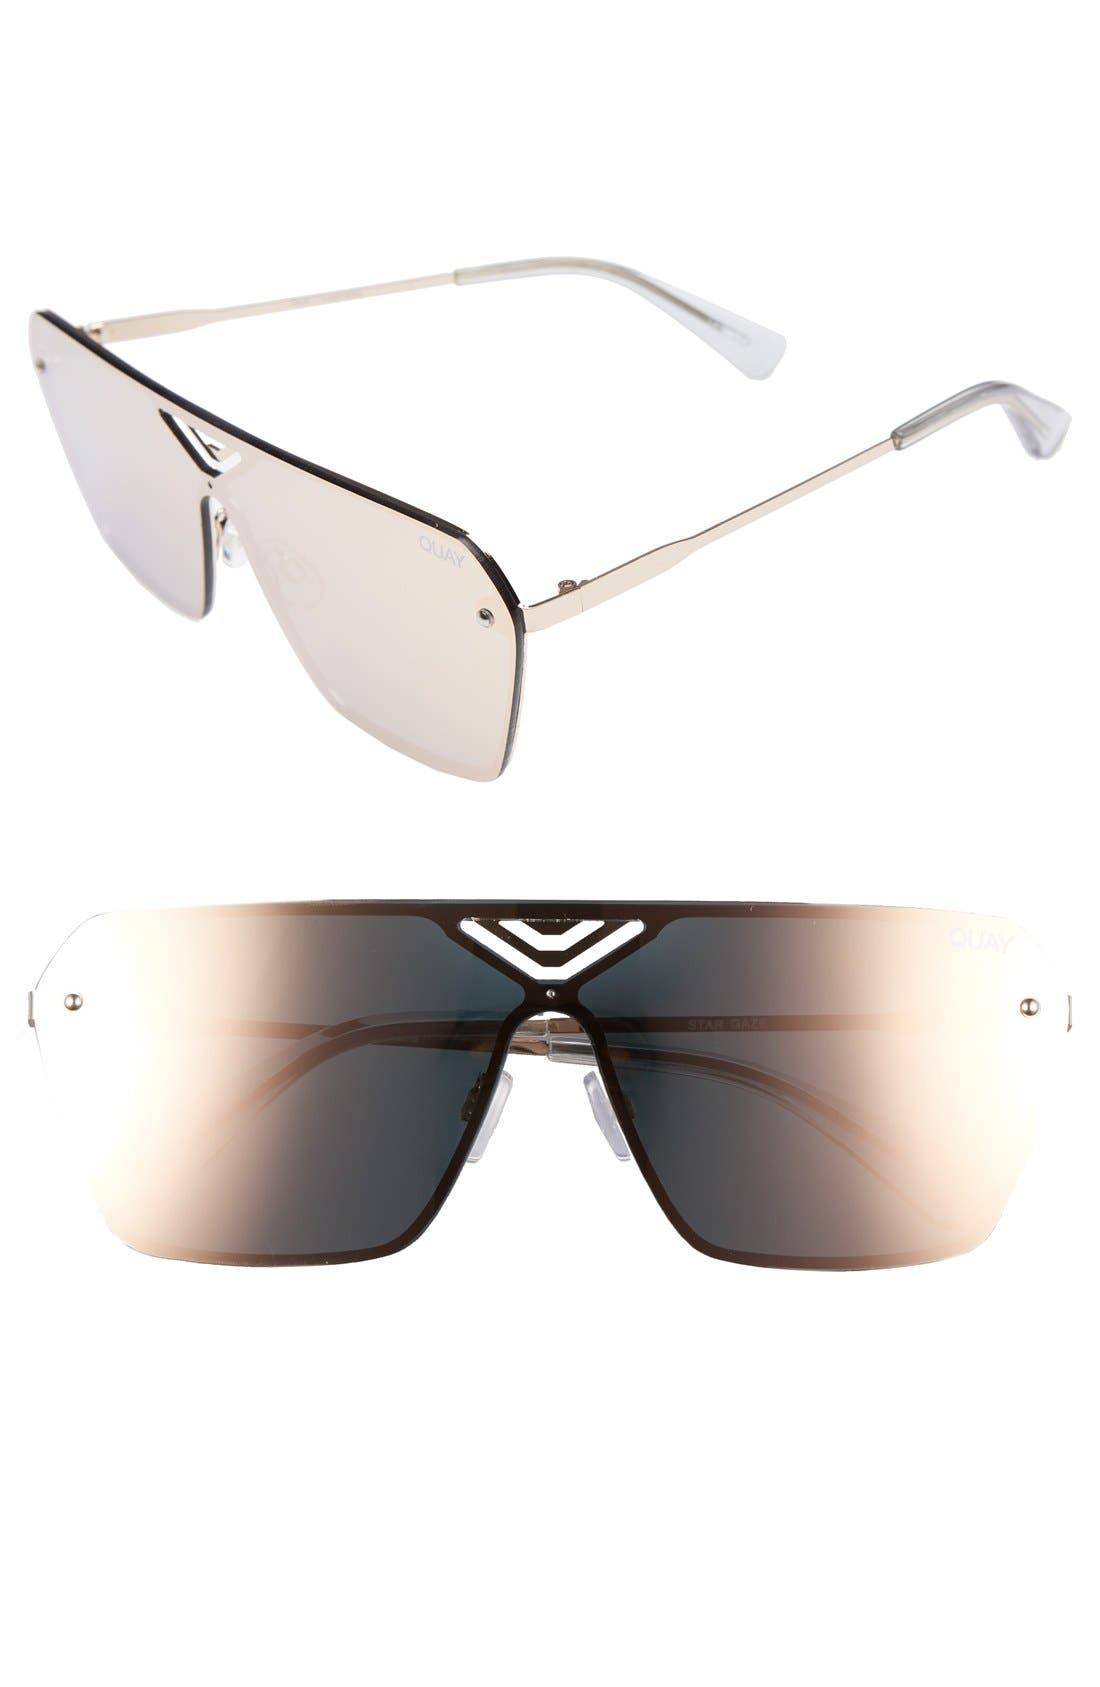 Star Gaze 68mm Mirrored Shield Sunglasses,                             Main thumbnail 1, color,                             710